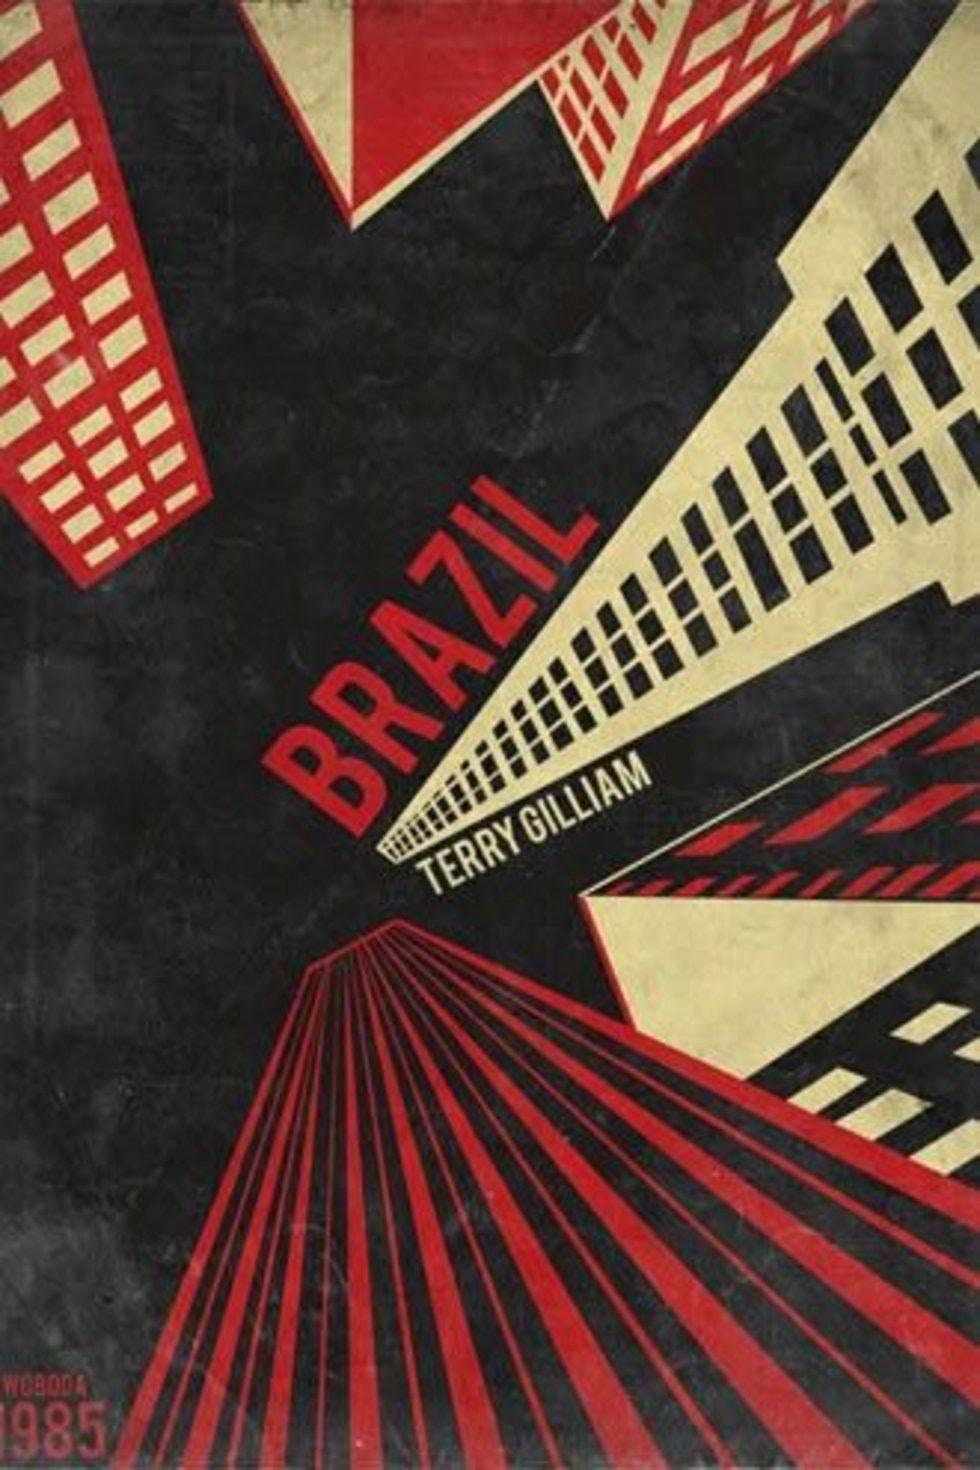 brazil filmi minimal afiş